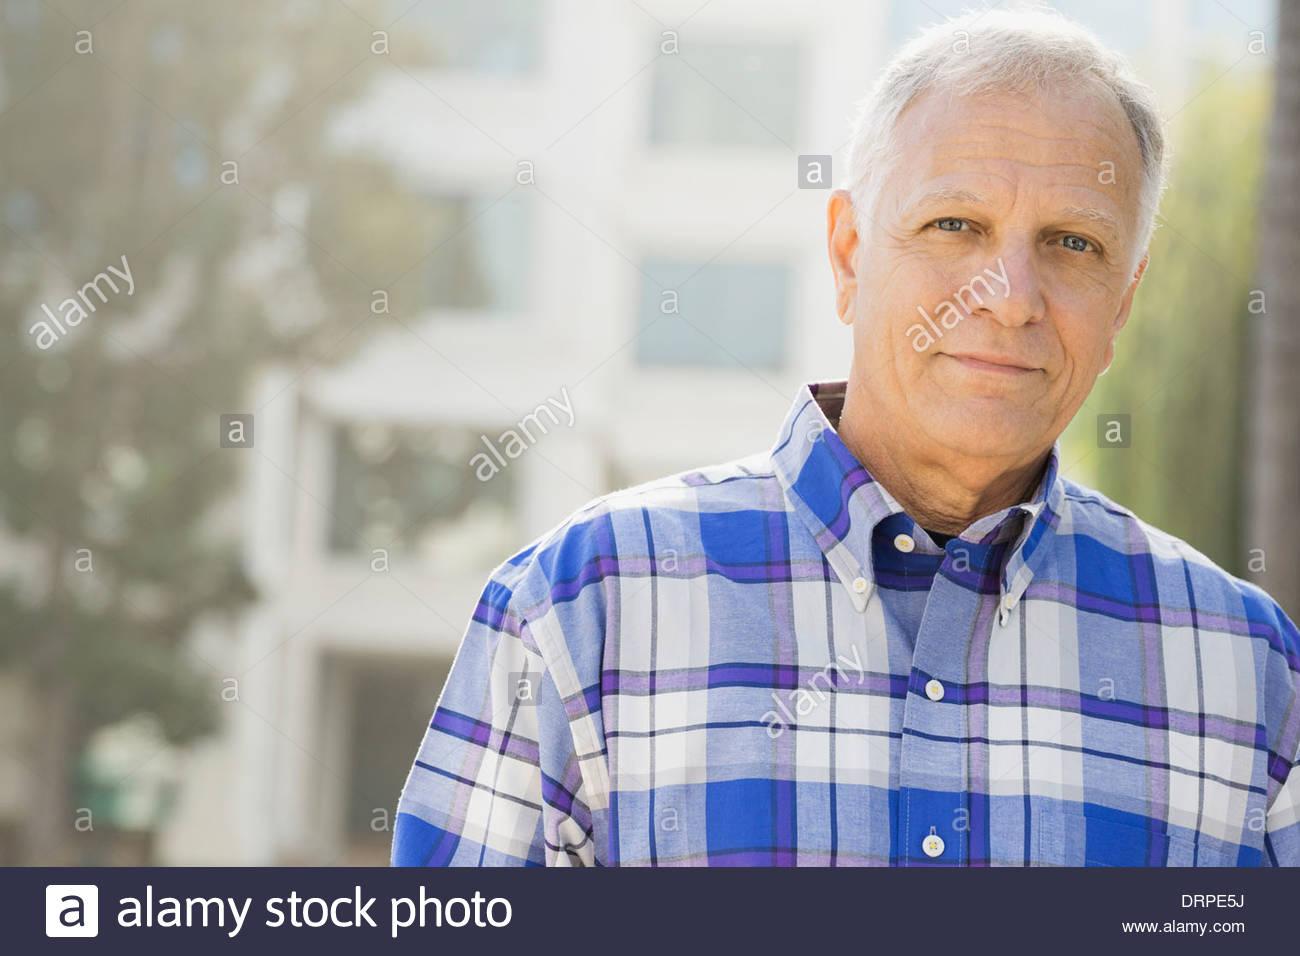 Portrait of senior man outdoors Photo Stock